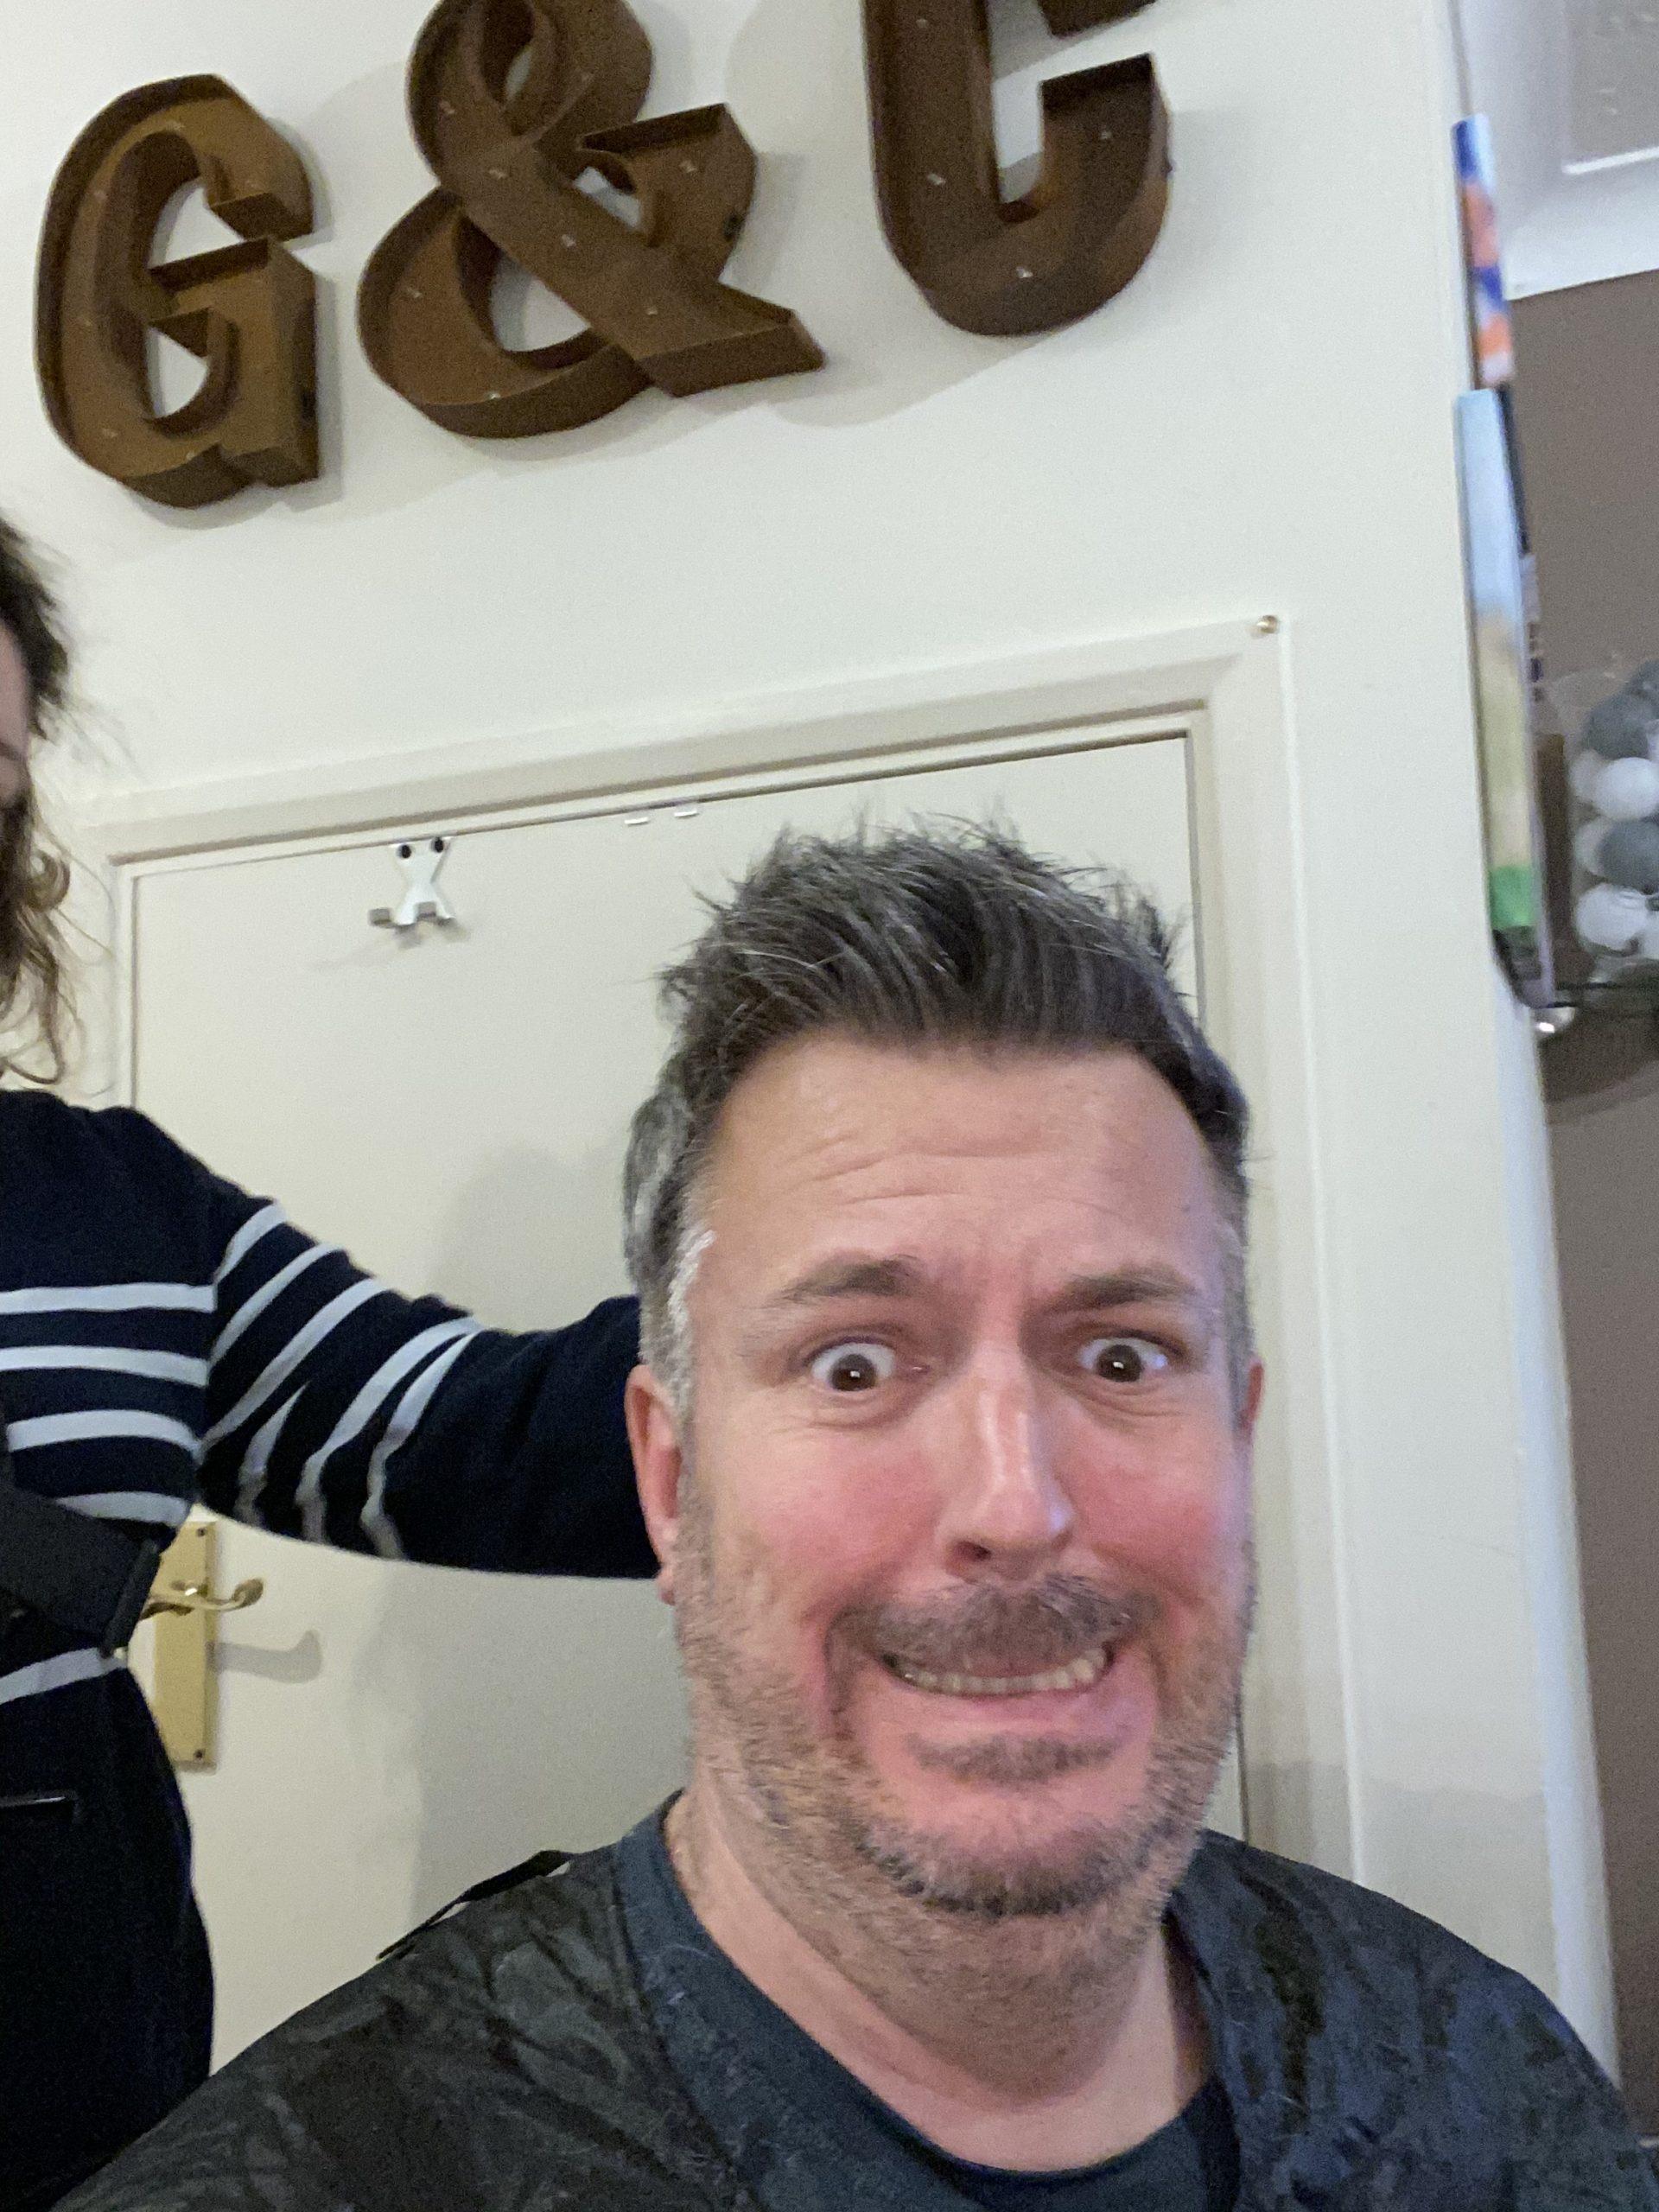 Lockdown Haircut III